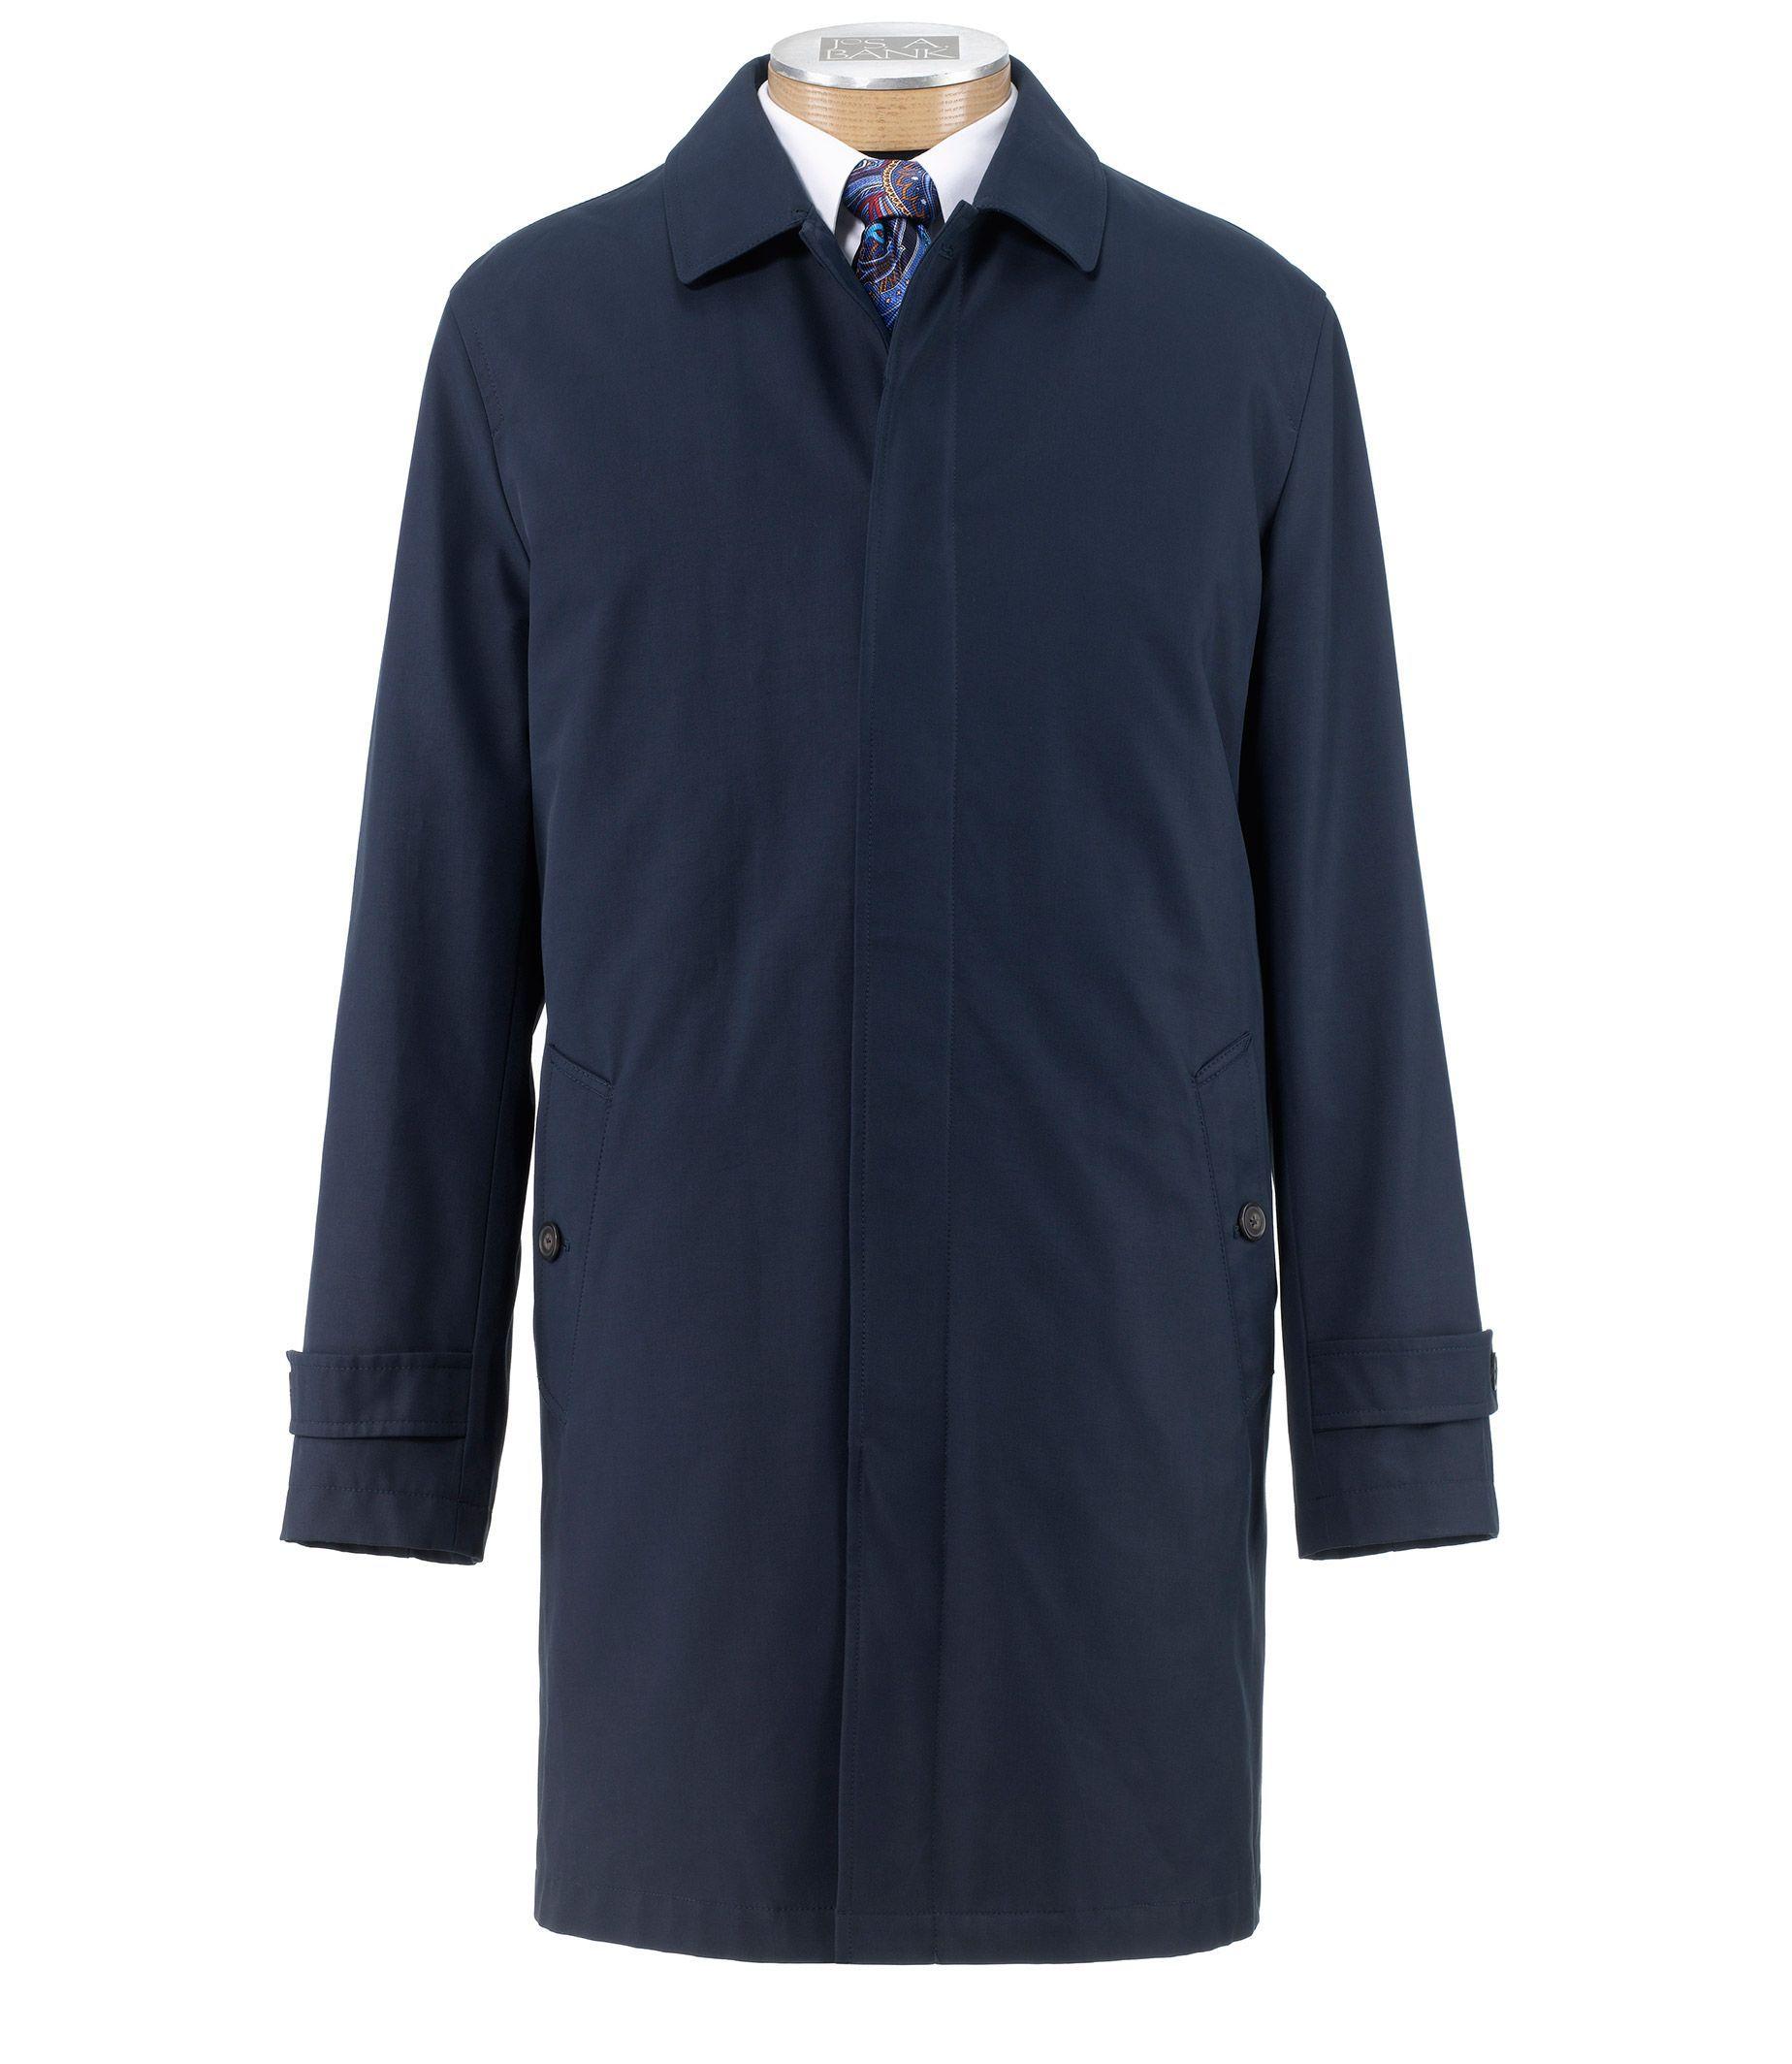 Executive Three-Quarter Length Raincoat